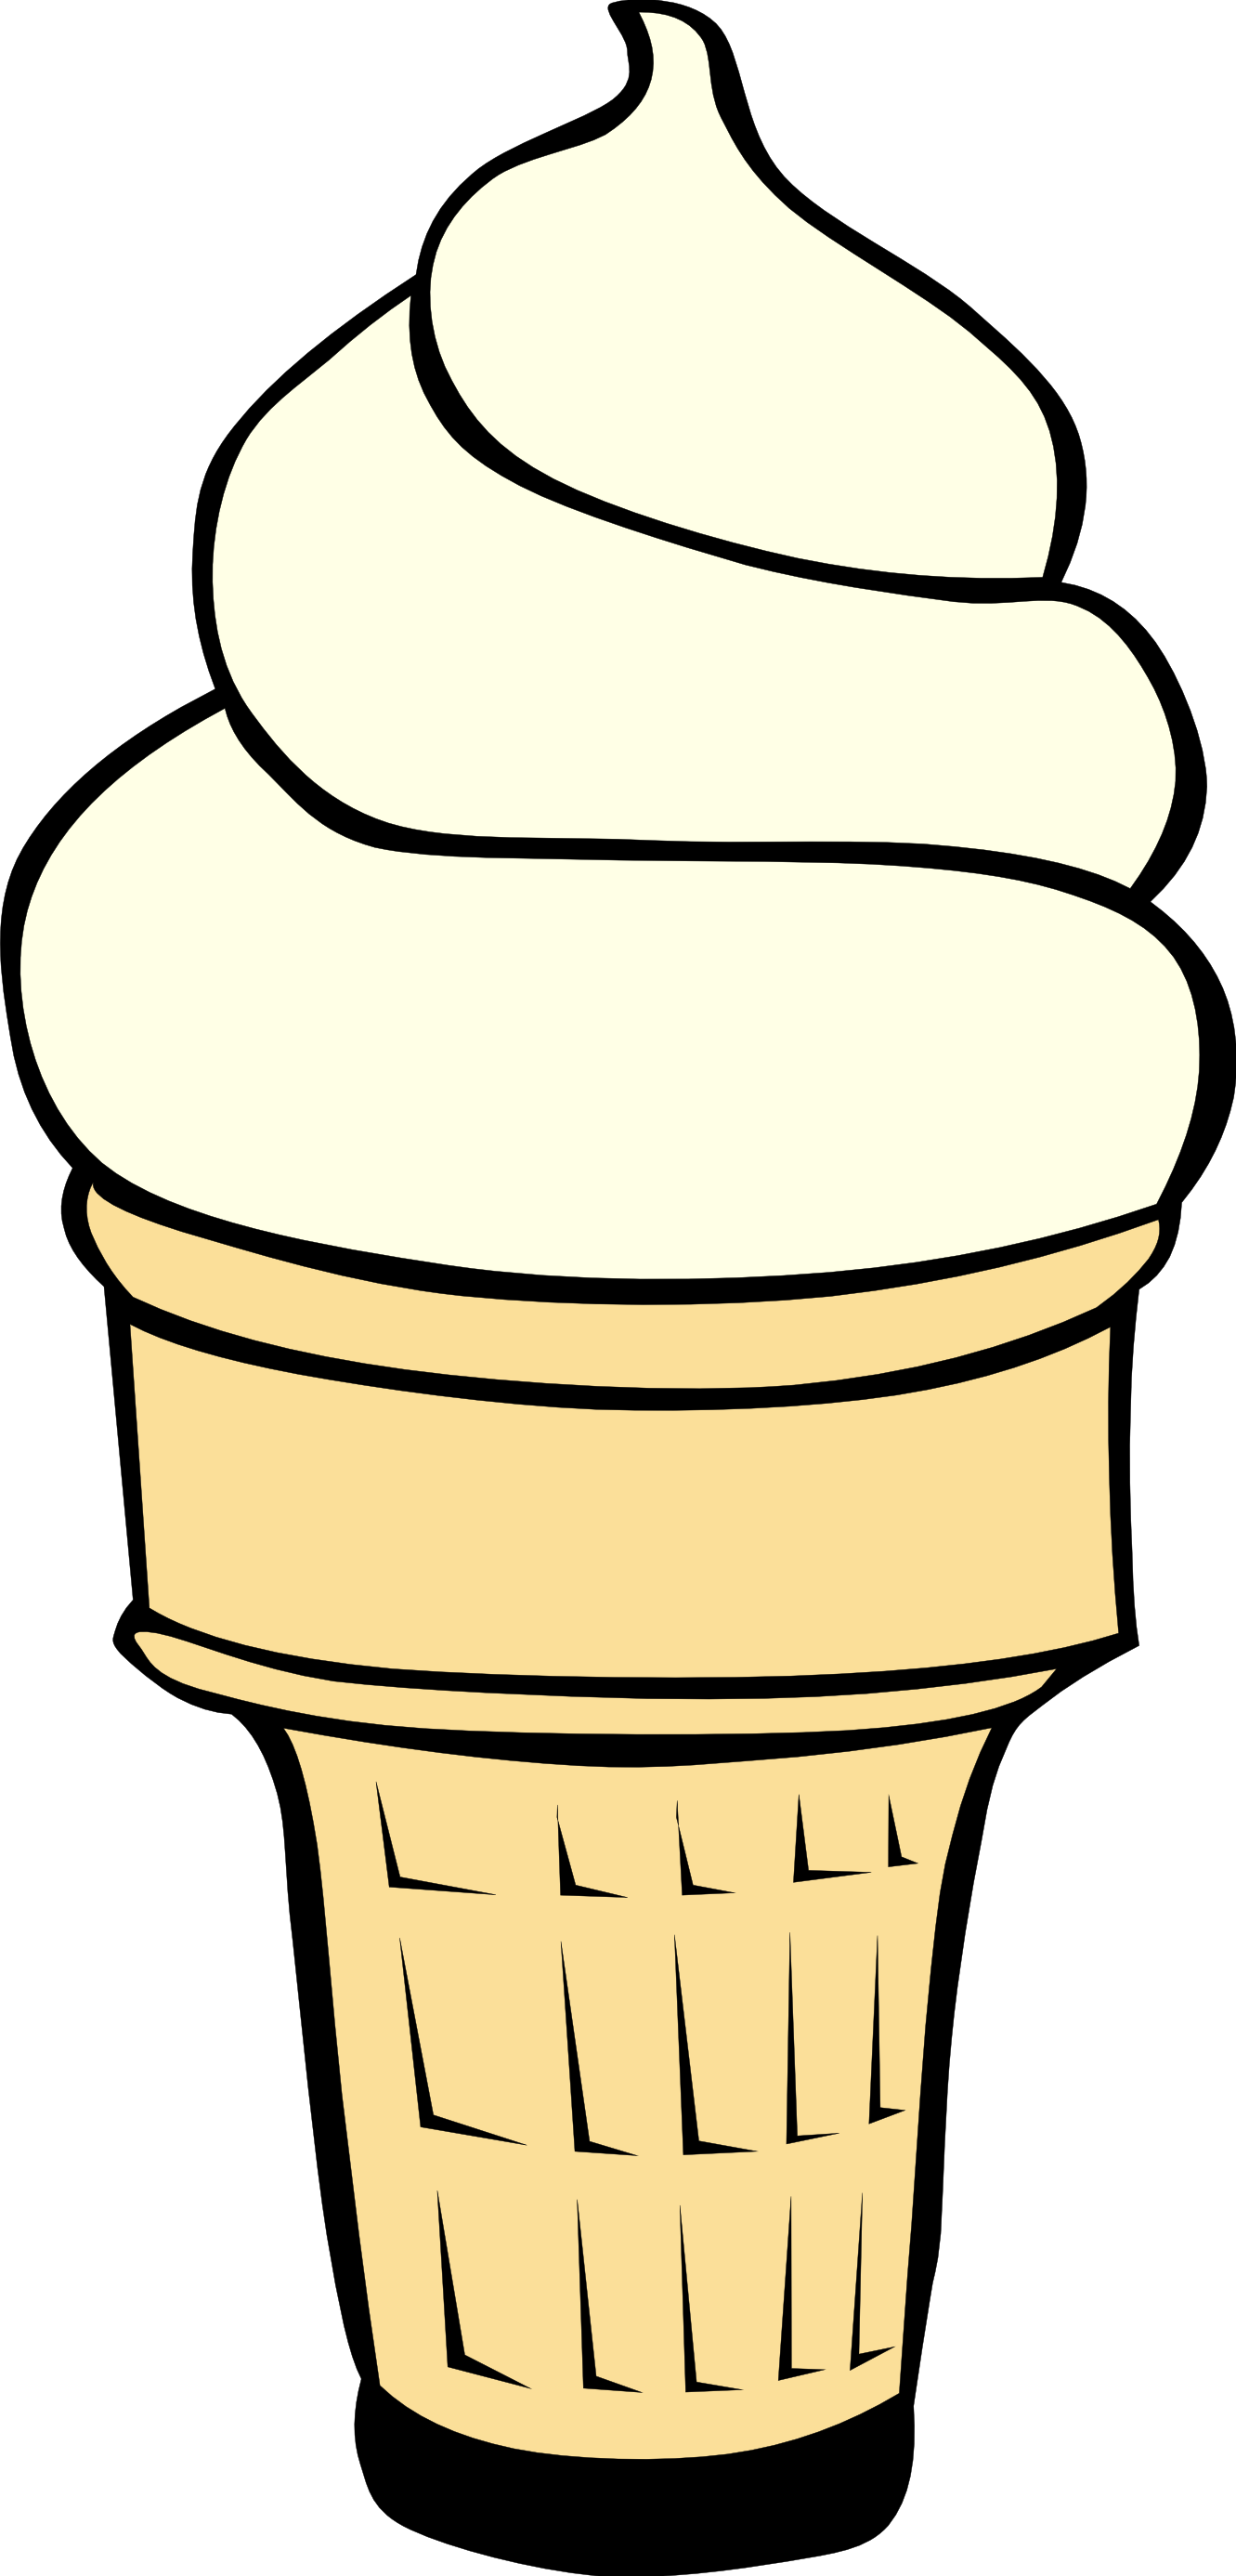 Ice cream cone ice cream clip art clipart